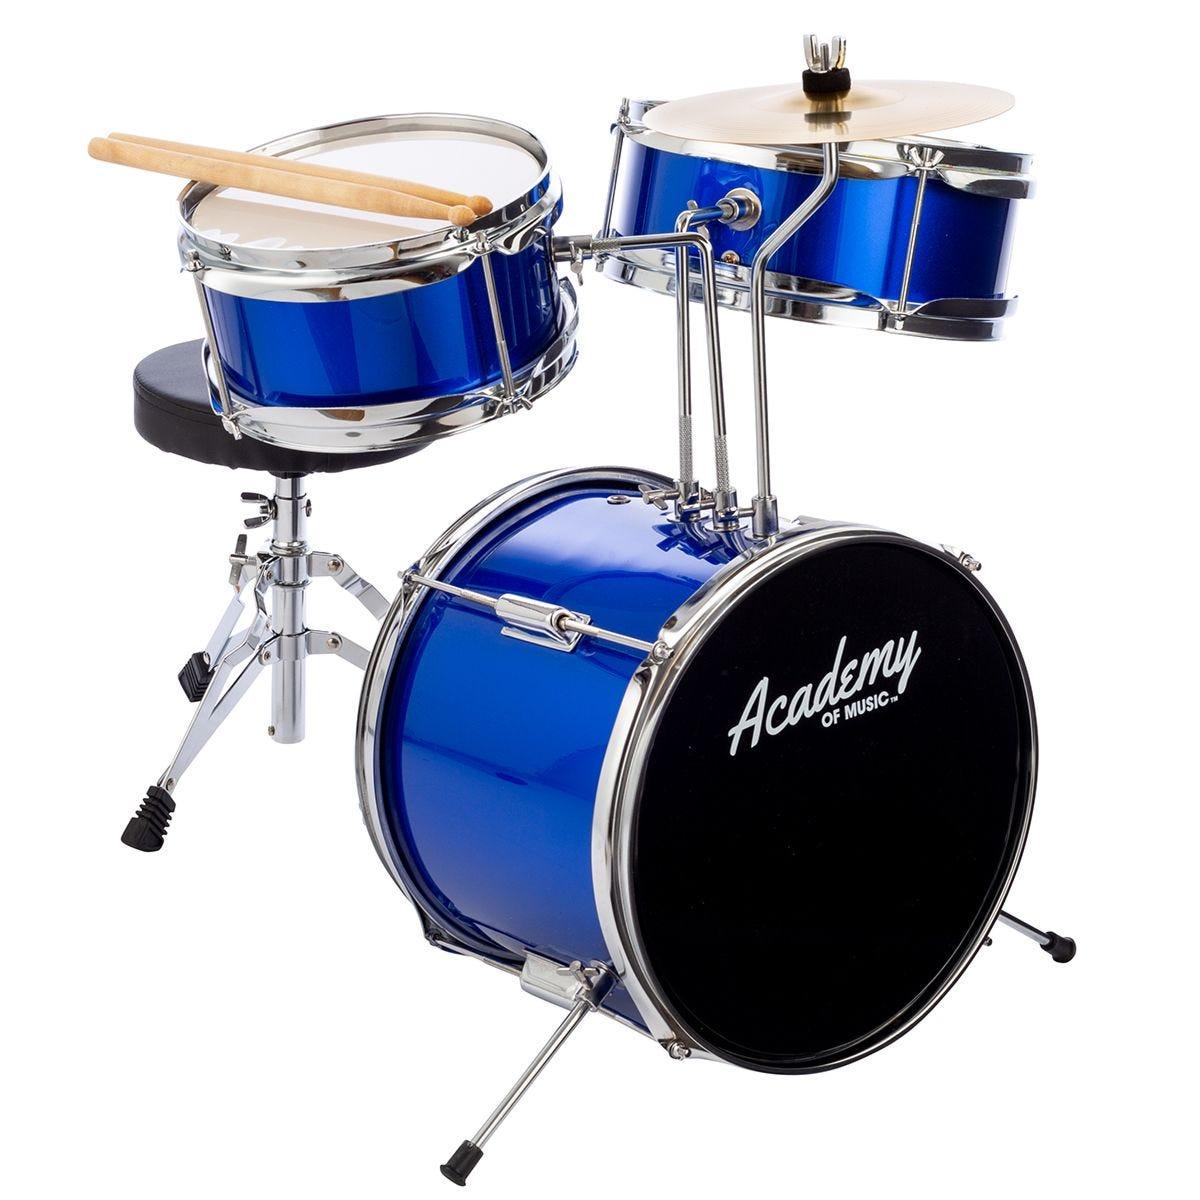 Academy Of Music Kids 3 Piece Drum Kit - Blue